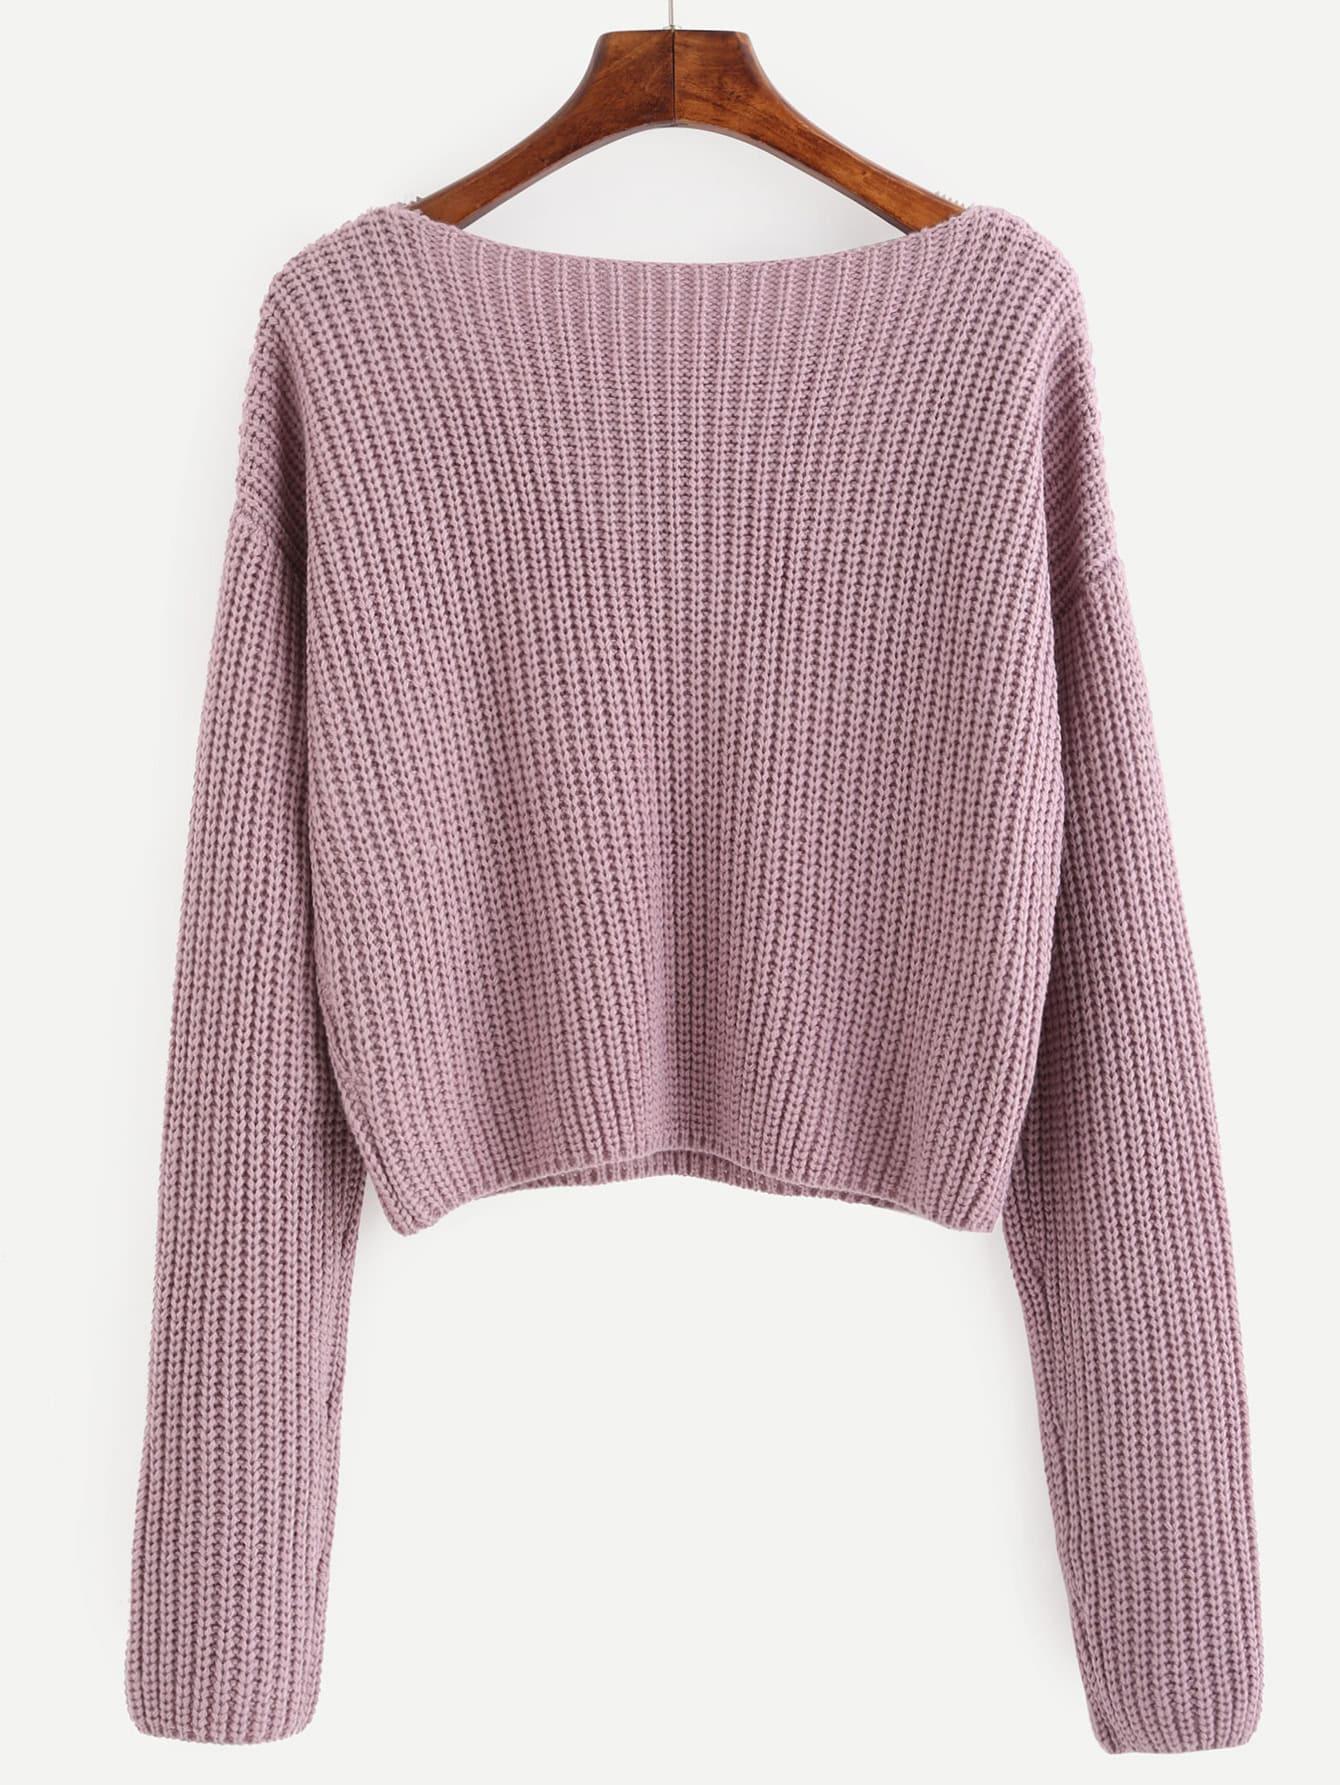 sweater160915404_2